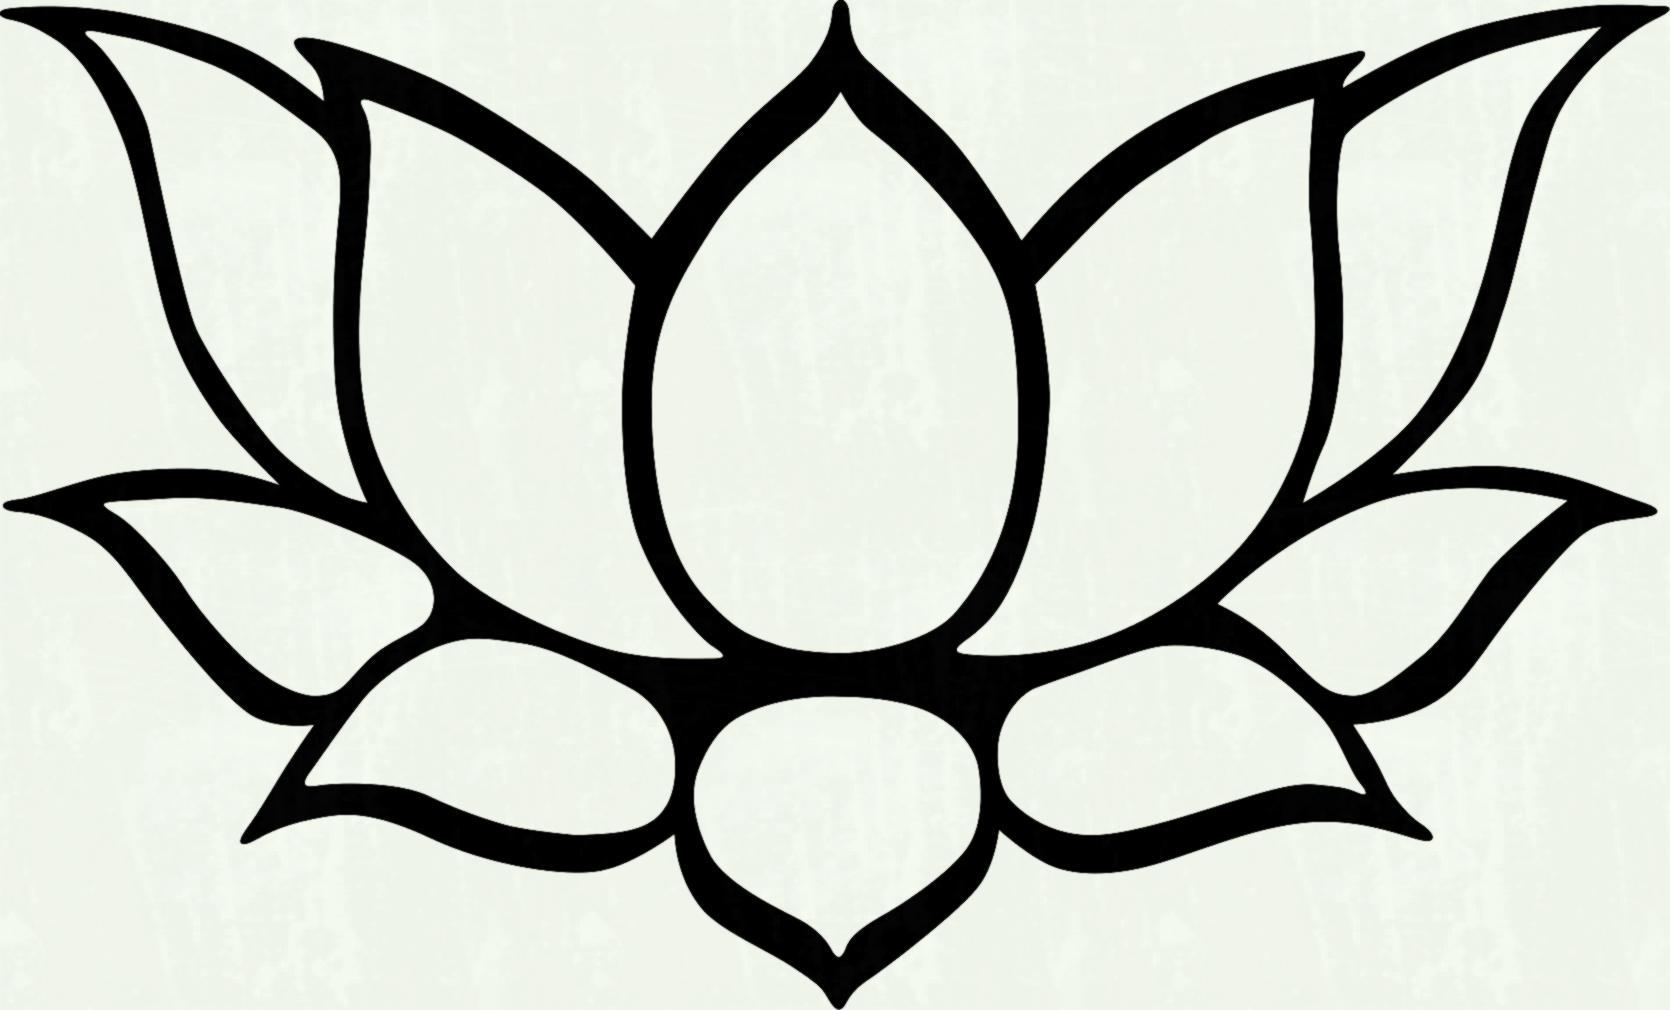 White lotus flower clipart 1 » Clipart Station.